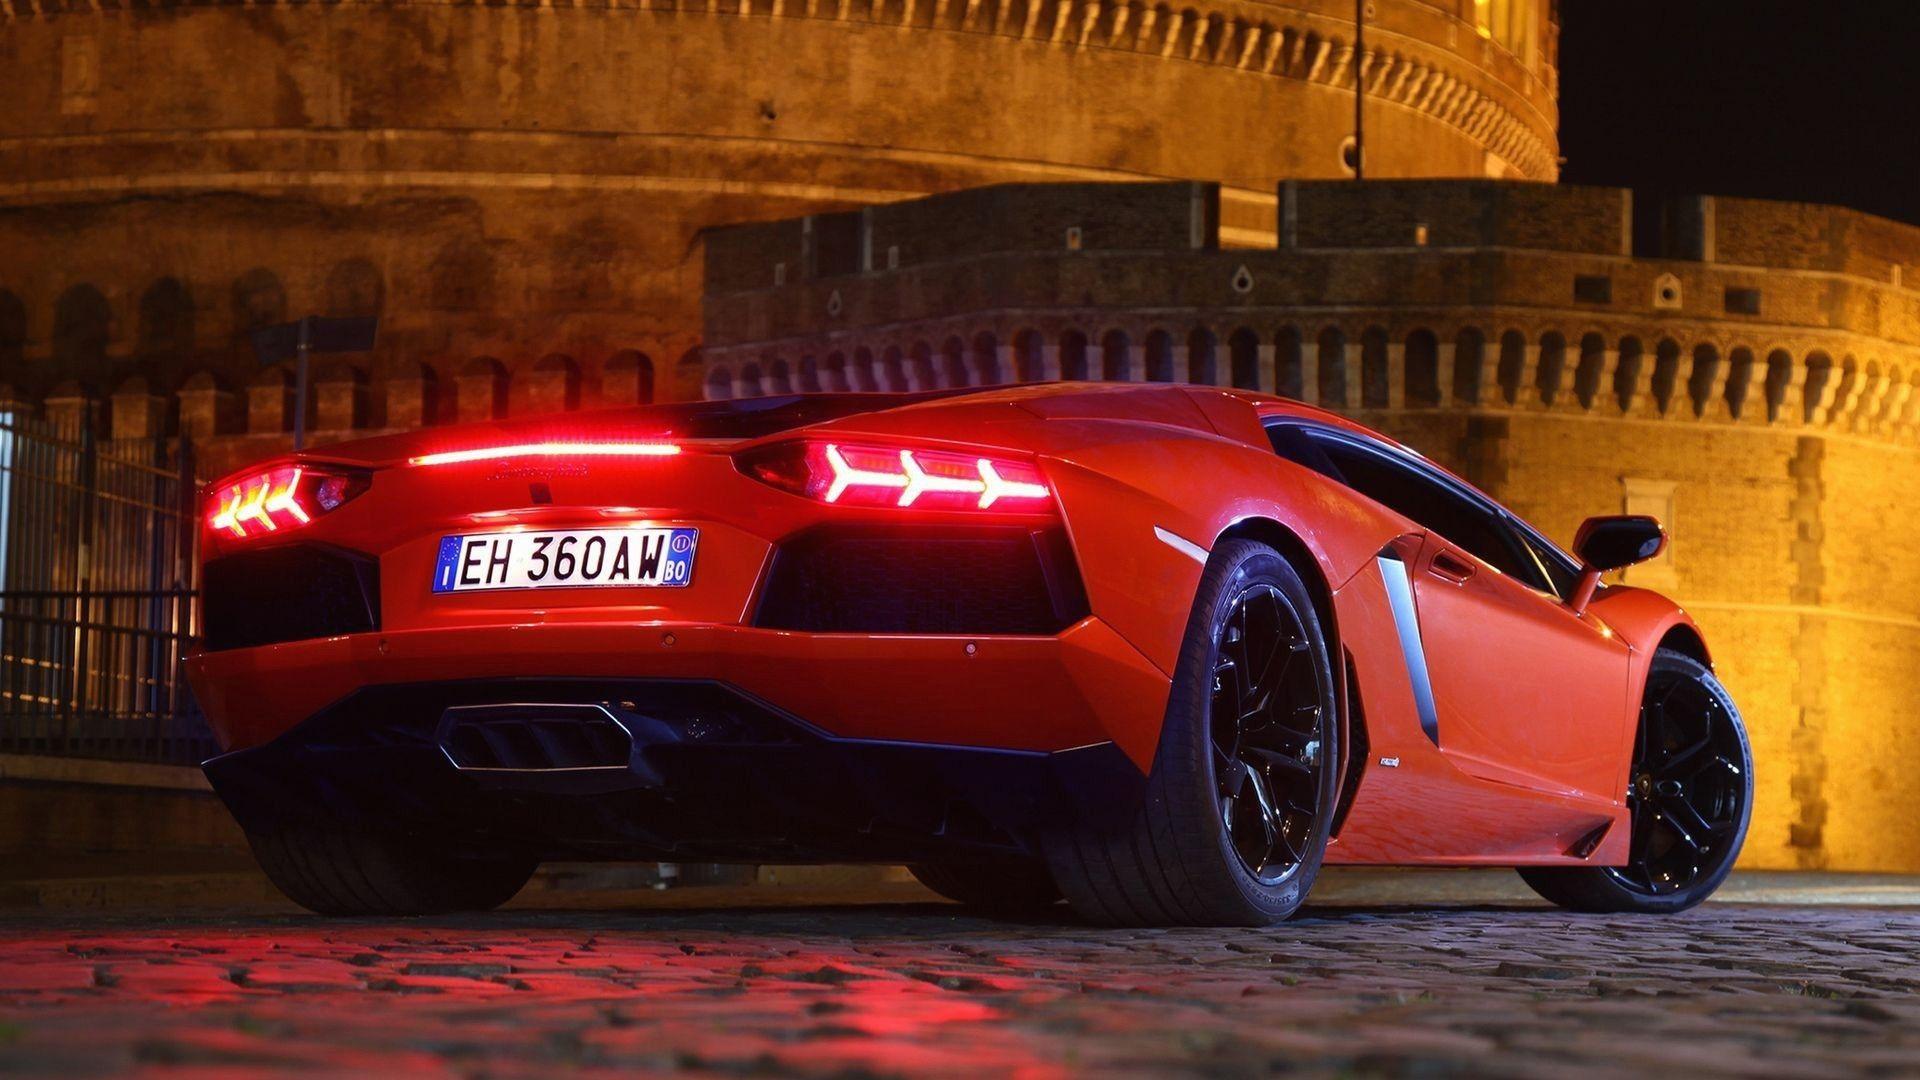 Ferrari Car Hd Wallpapers 1080p 330301 Red Lamborghini